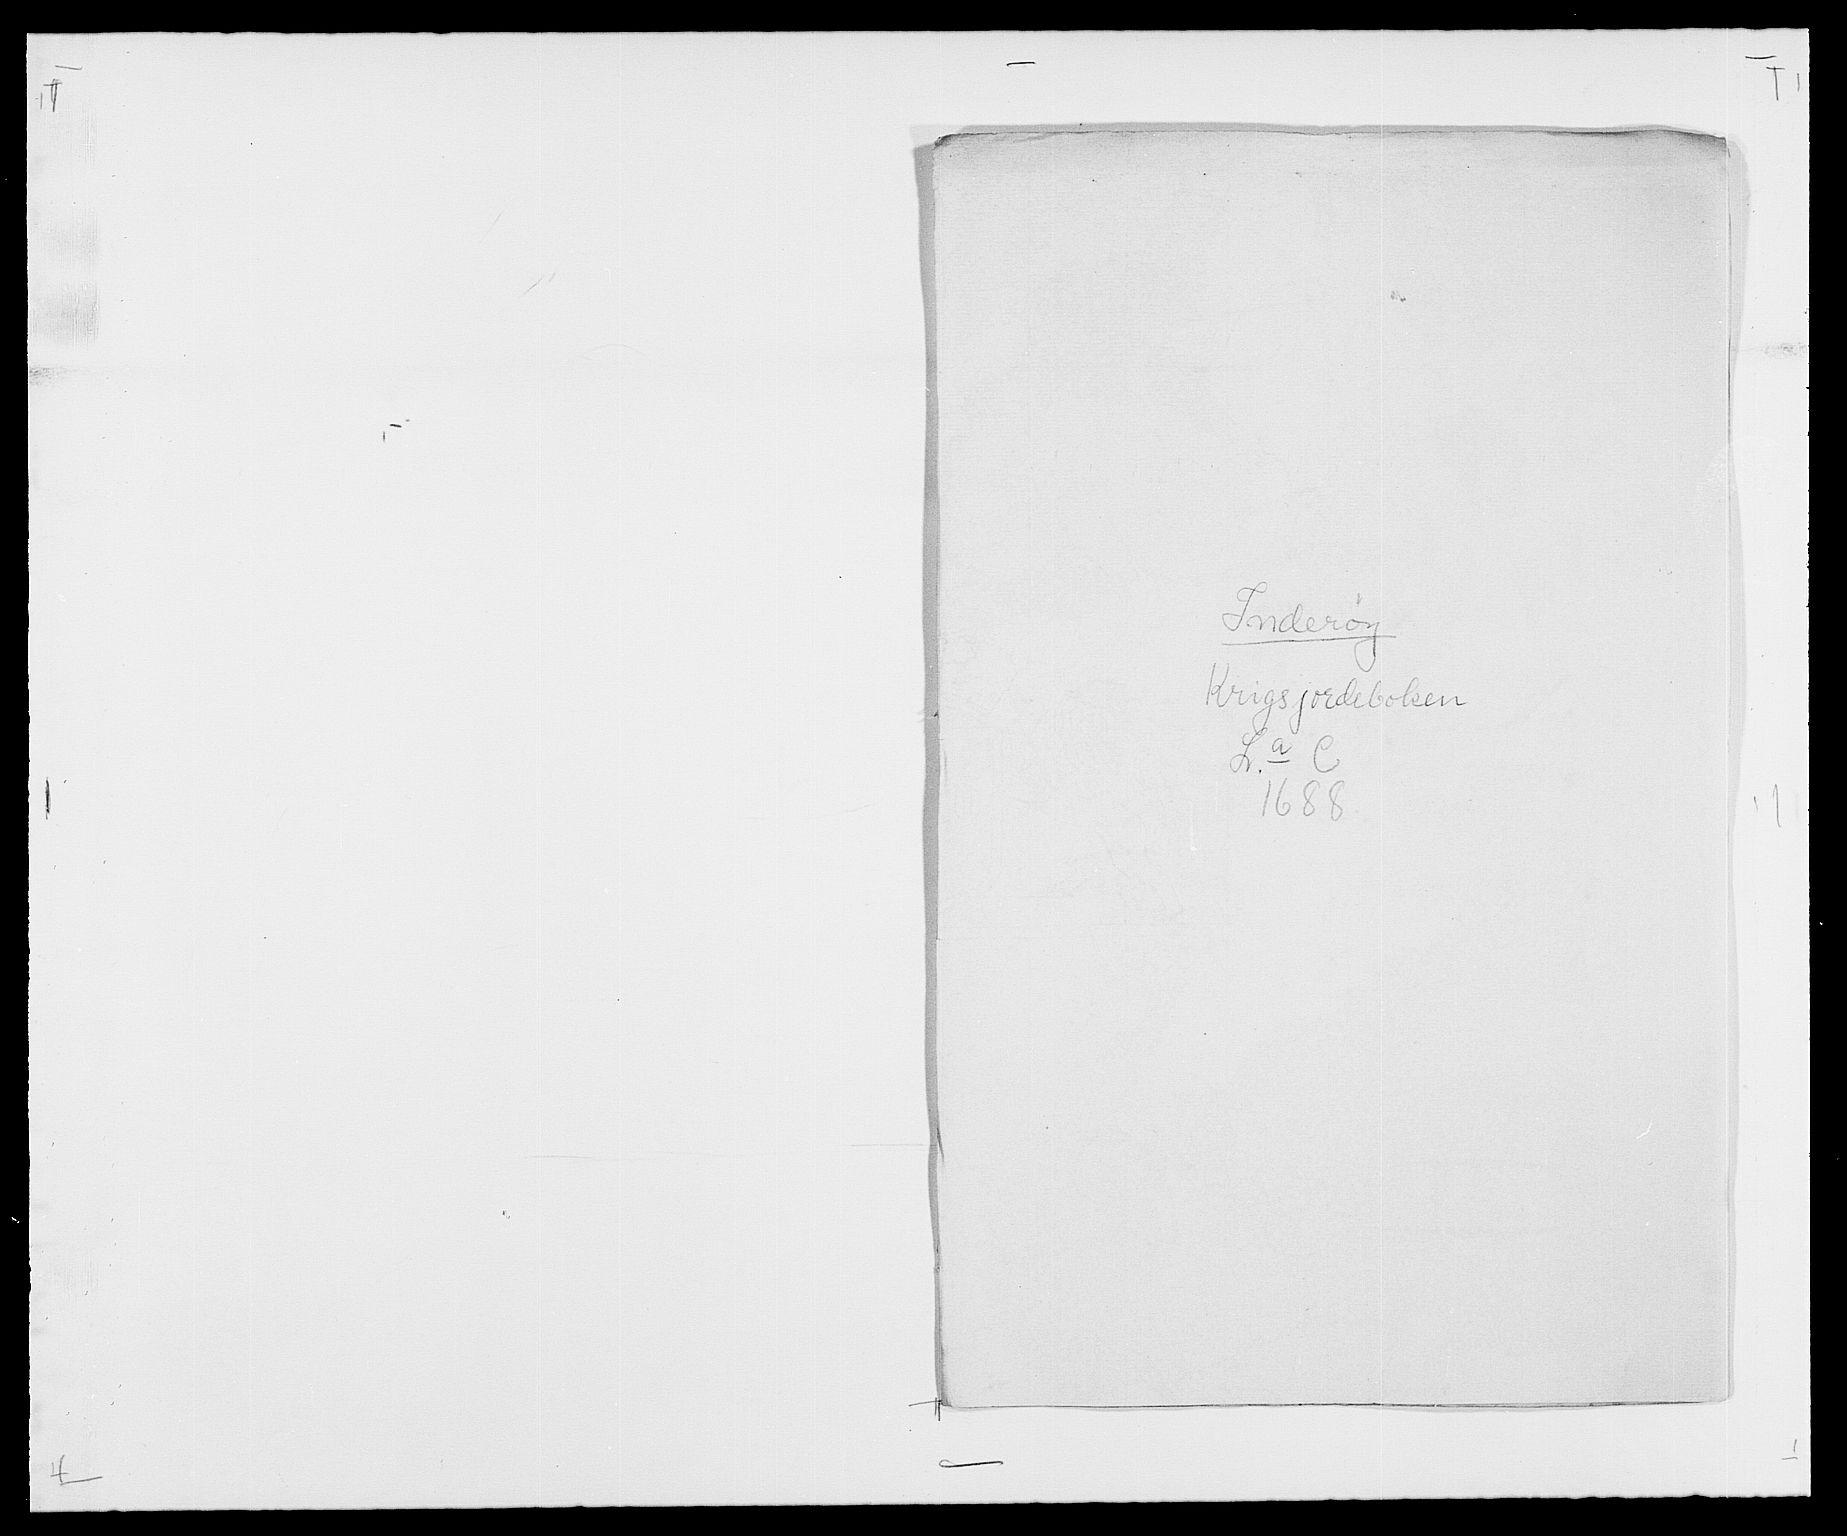 RA, Rentekammeret inntil 1814, Reviderte regnskaper, Fogderegnskap, R63/L4306: Fogderegnskap Inderøy, 1687-1689, s. 249